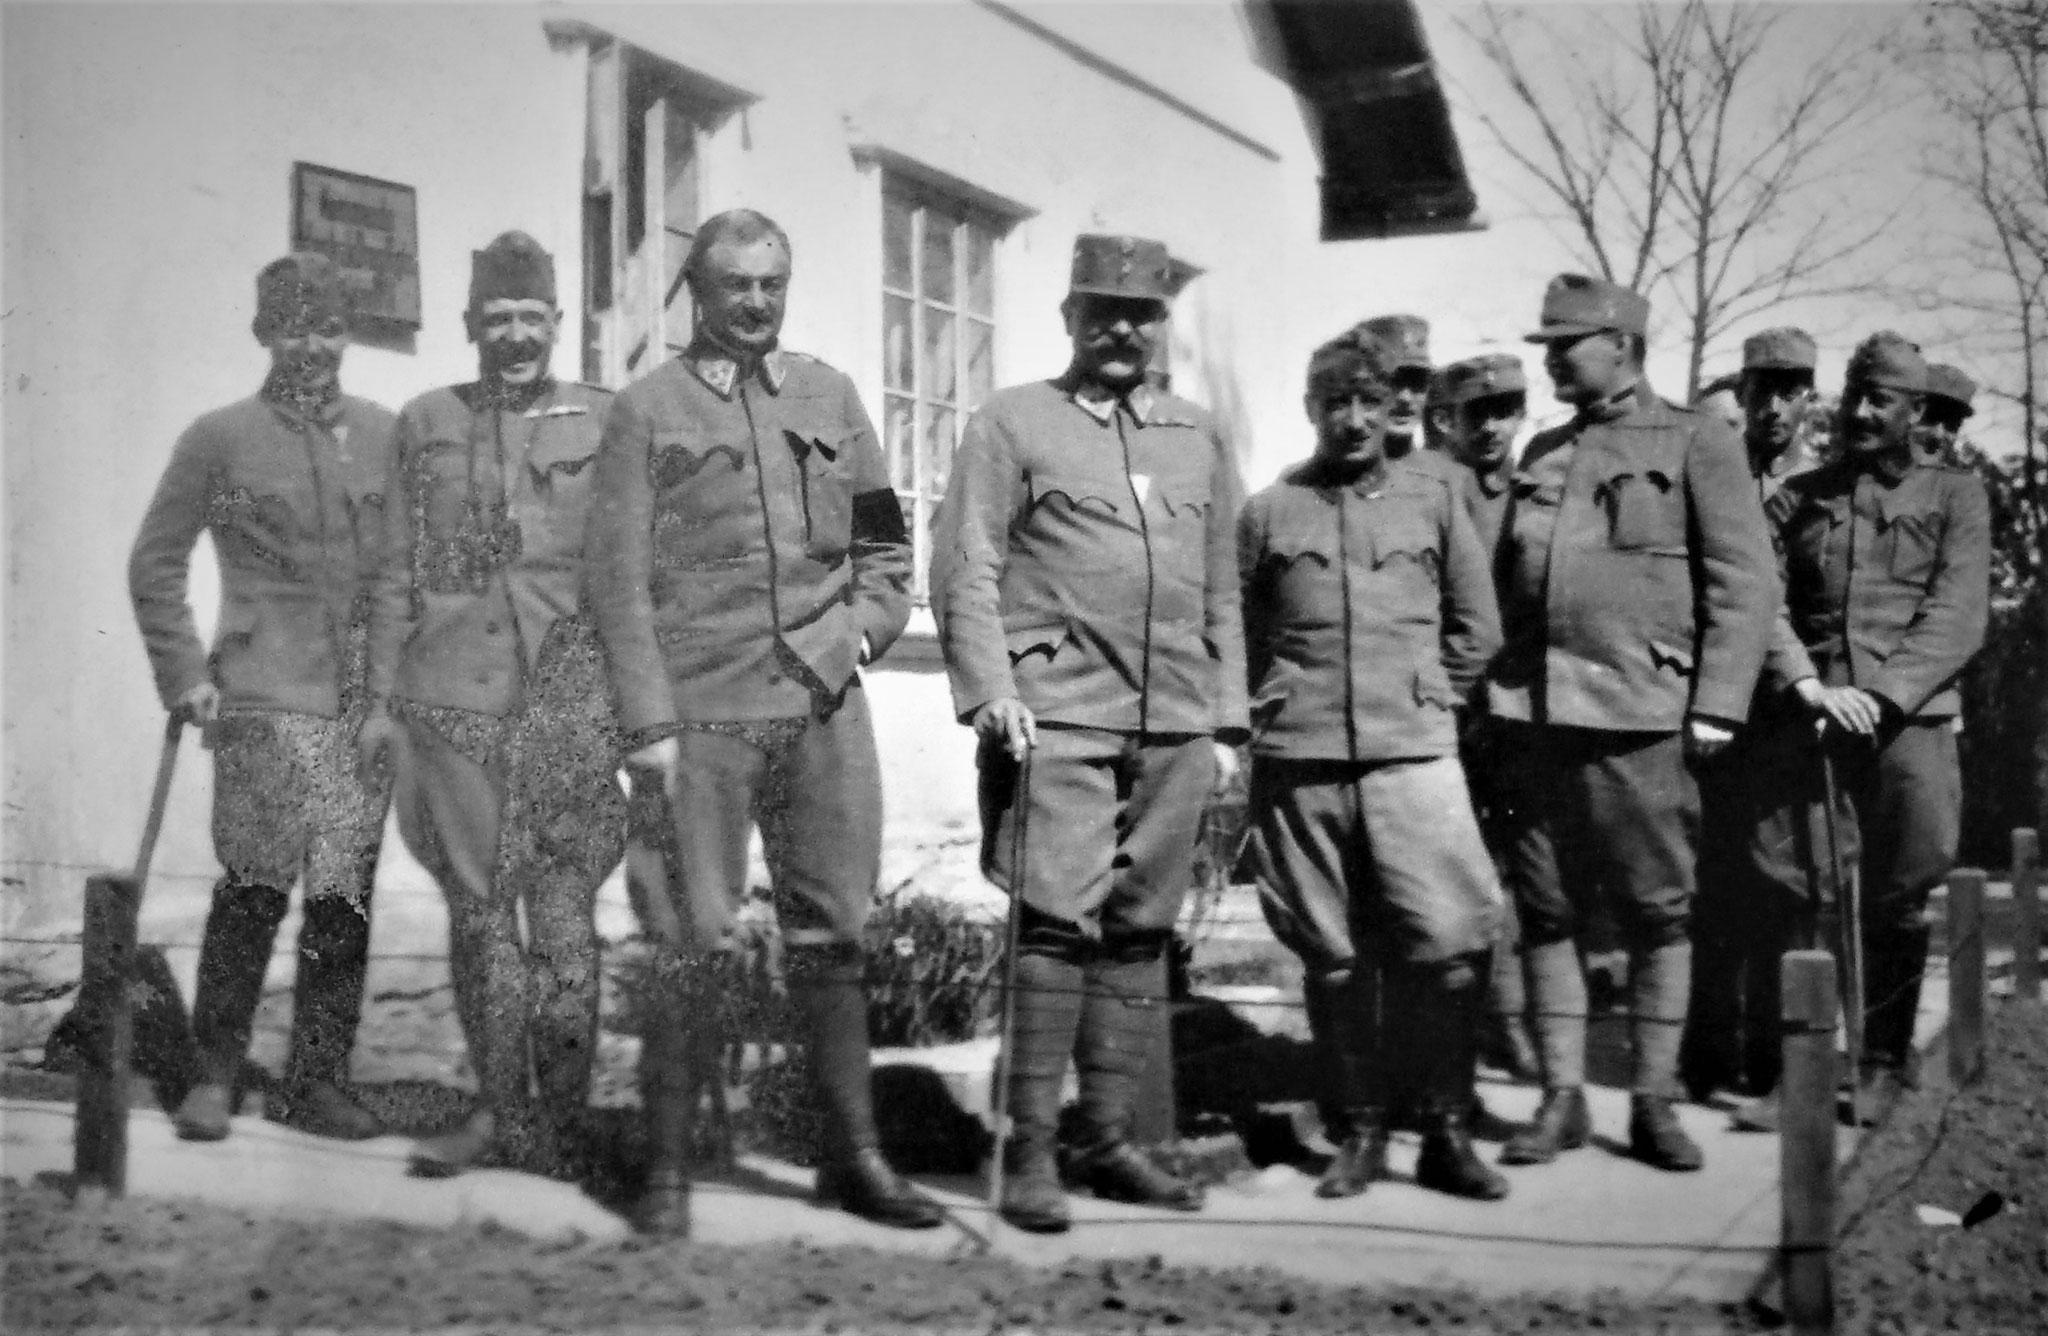 Lt Zanger (D.11), ich, Obst Alberti d'Enno (HR. 11), Oberst Julius Plankh, Mjr Pfannenstiel (RAD 10), Rtm. Riedl (D. 11), Obstlt Hänisch (D.11), Oblt v. Wense (D.11), Rtm. Fanto.